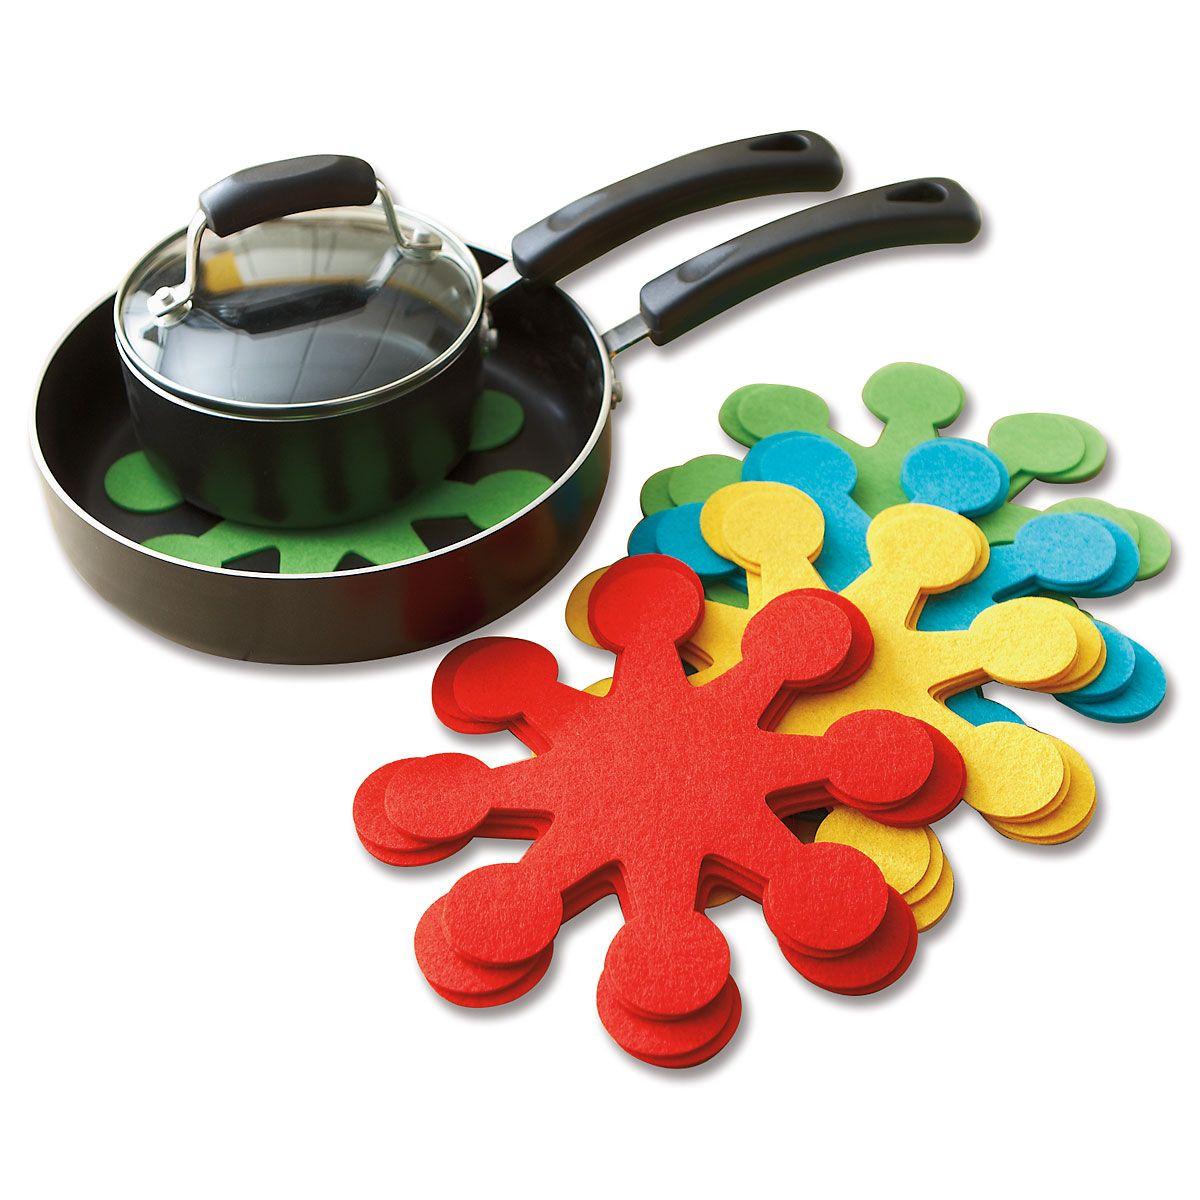 Pan and Plate Protectors